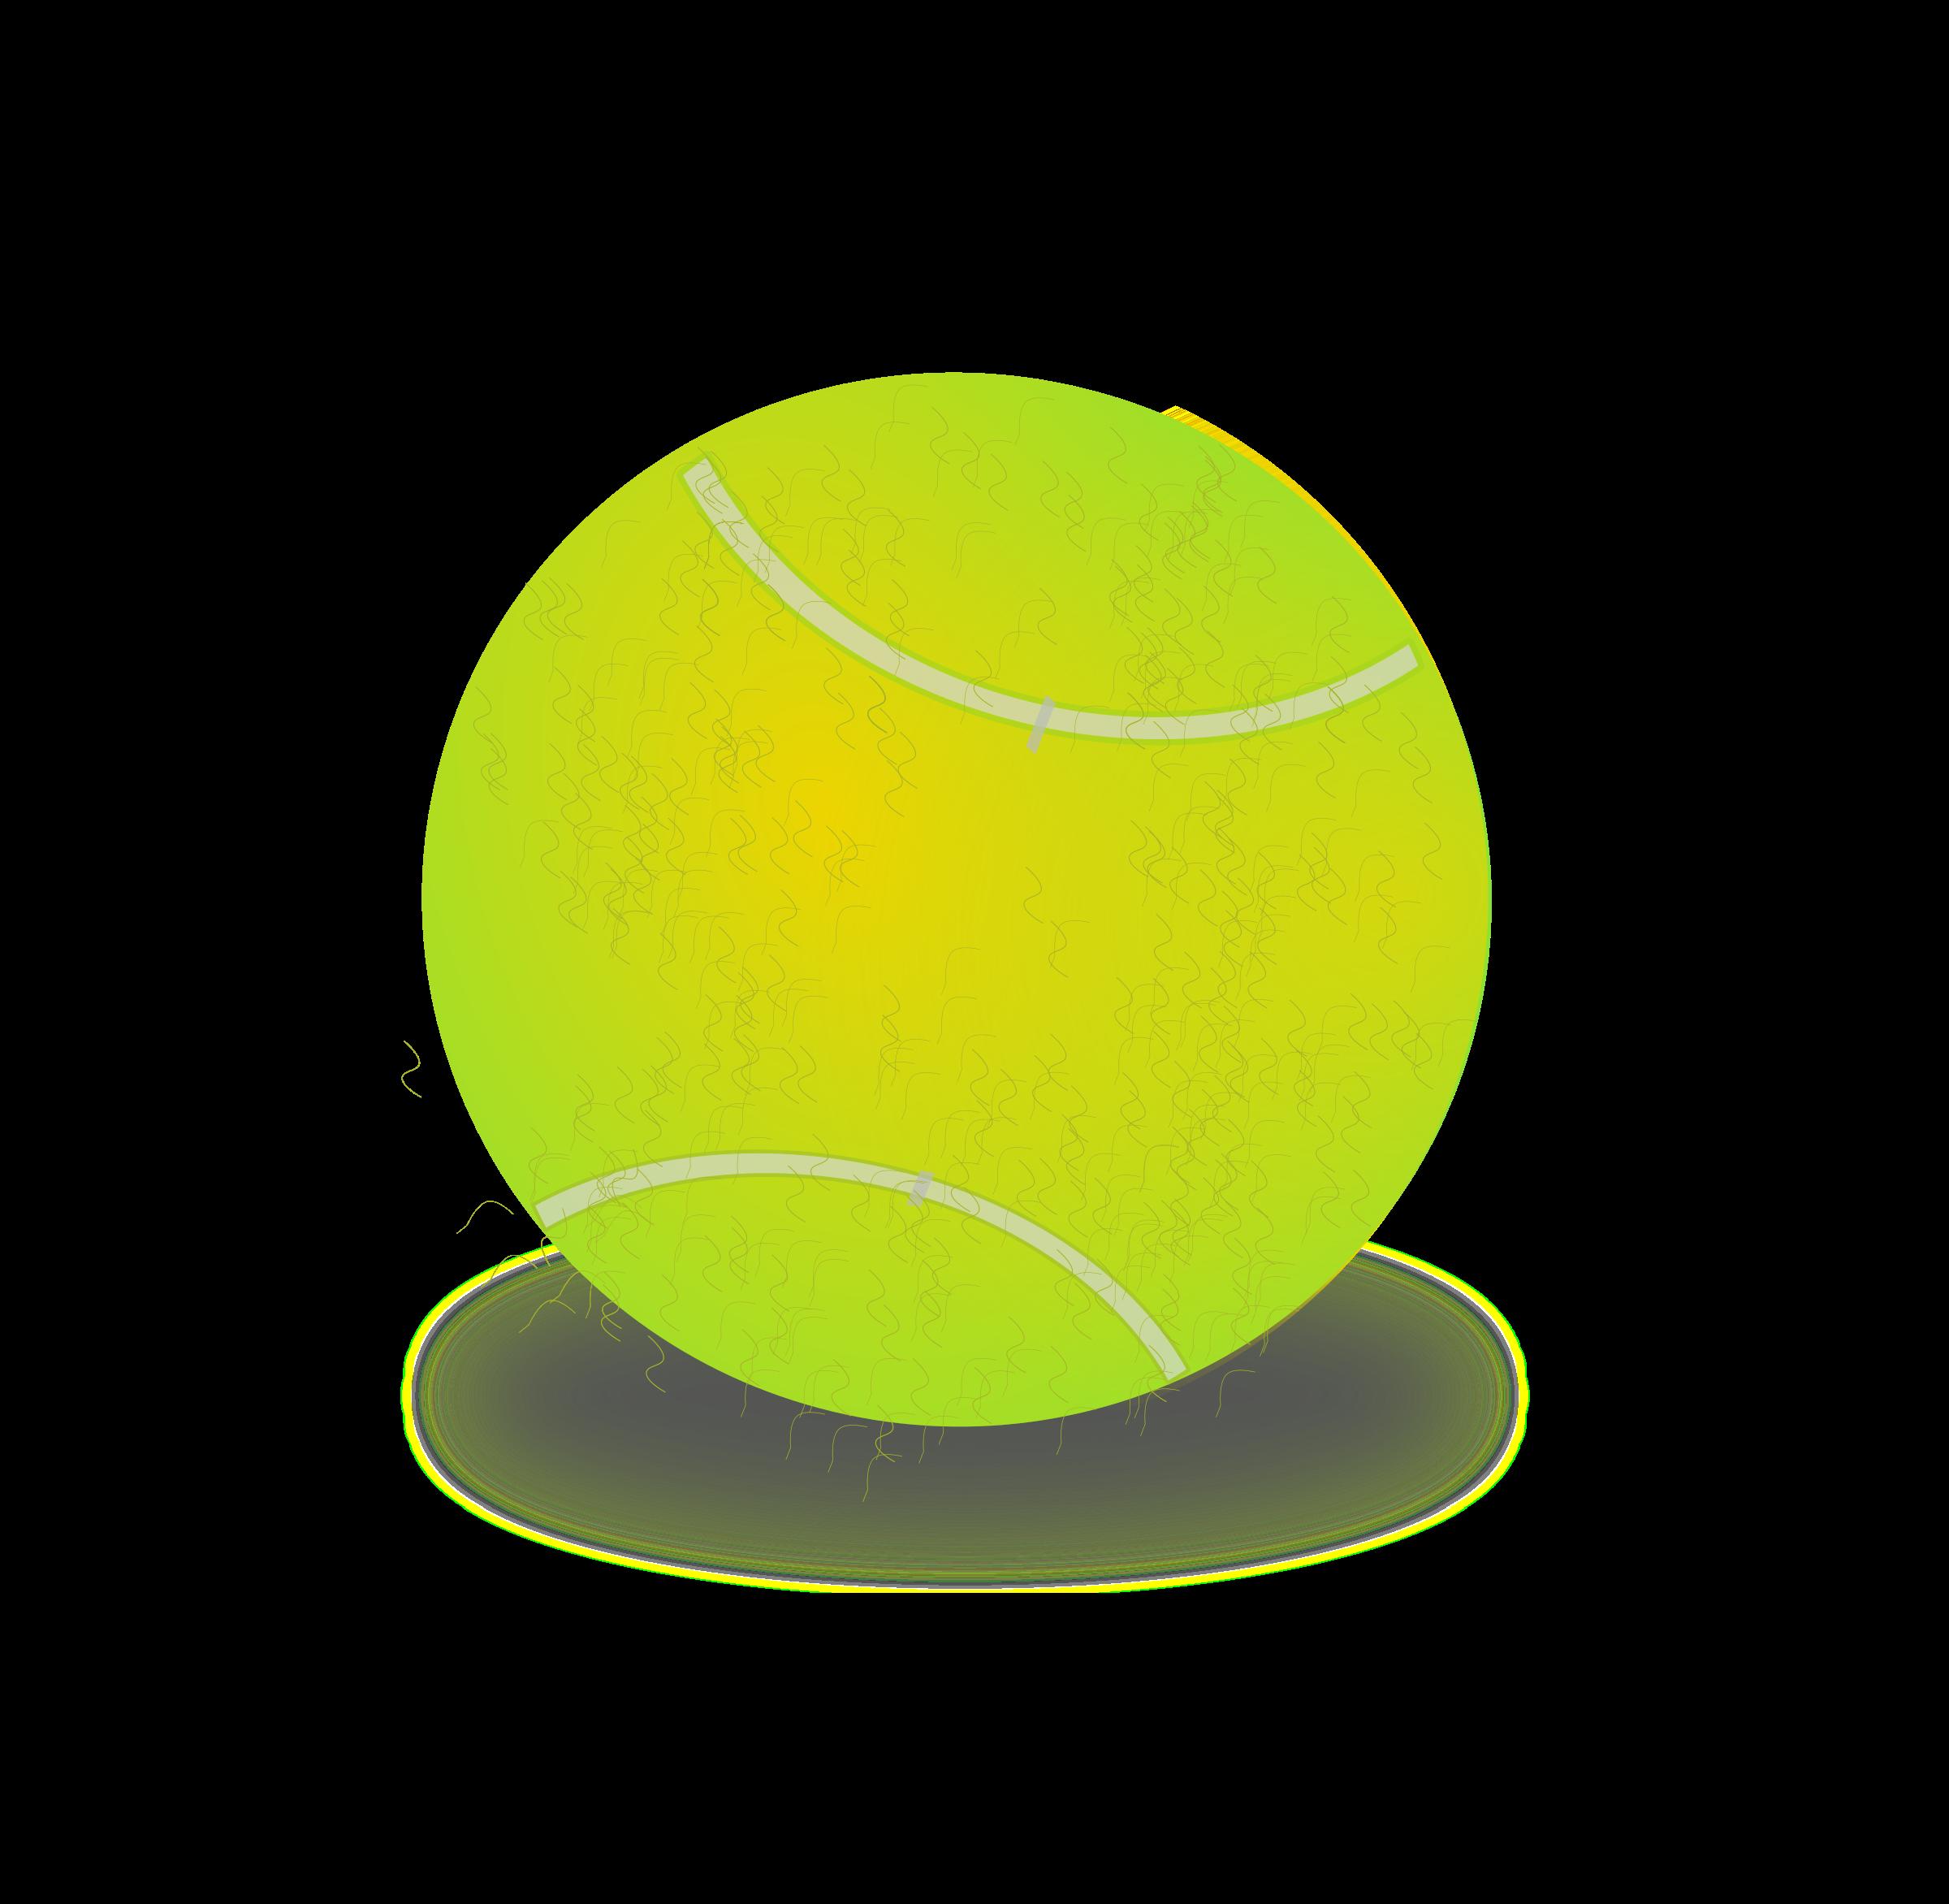 Clipart - Tennis ball